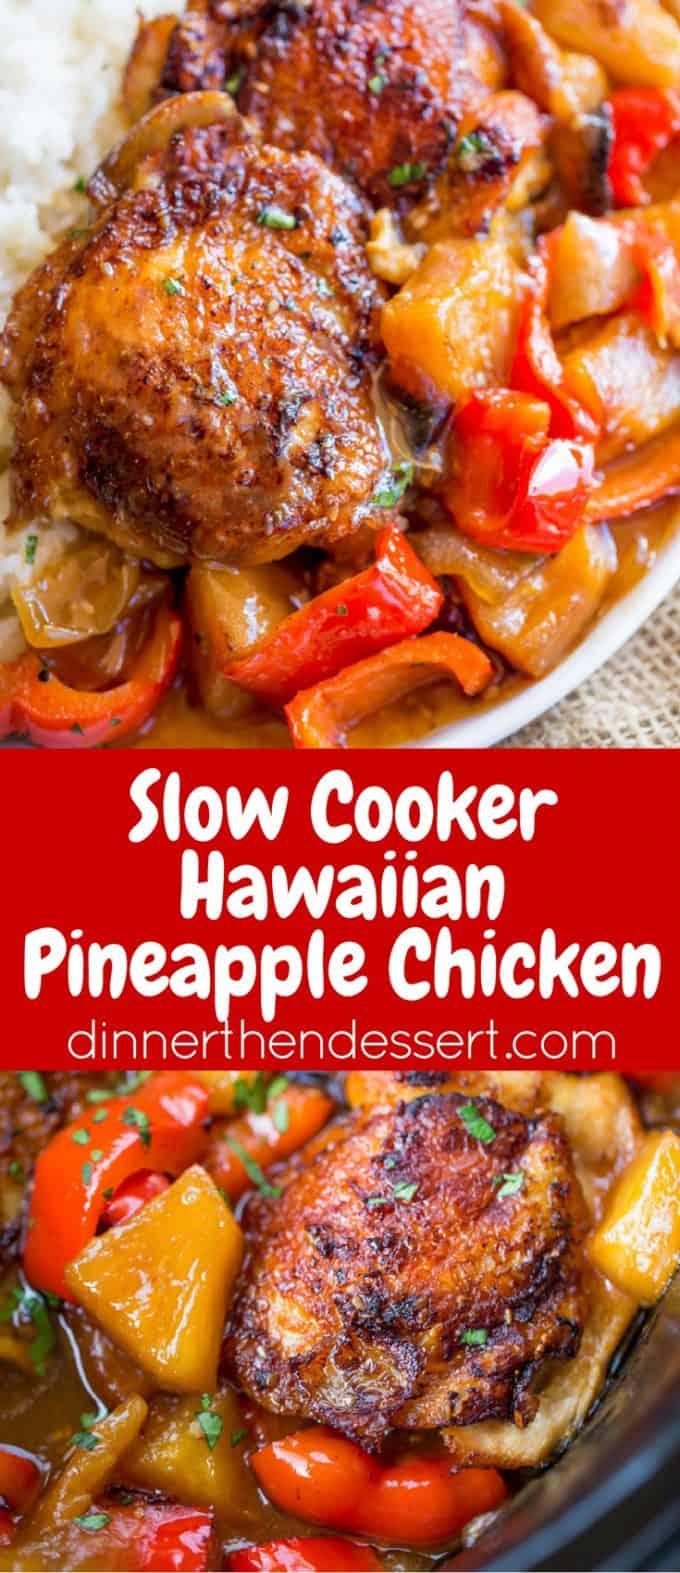 Slow Cooker Hawaiian Pineapple Chicken - Dinner, then Dessert